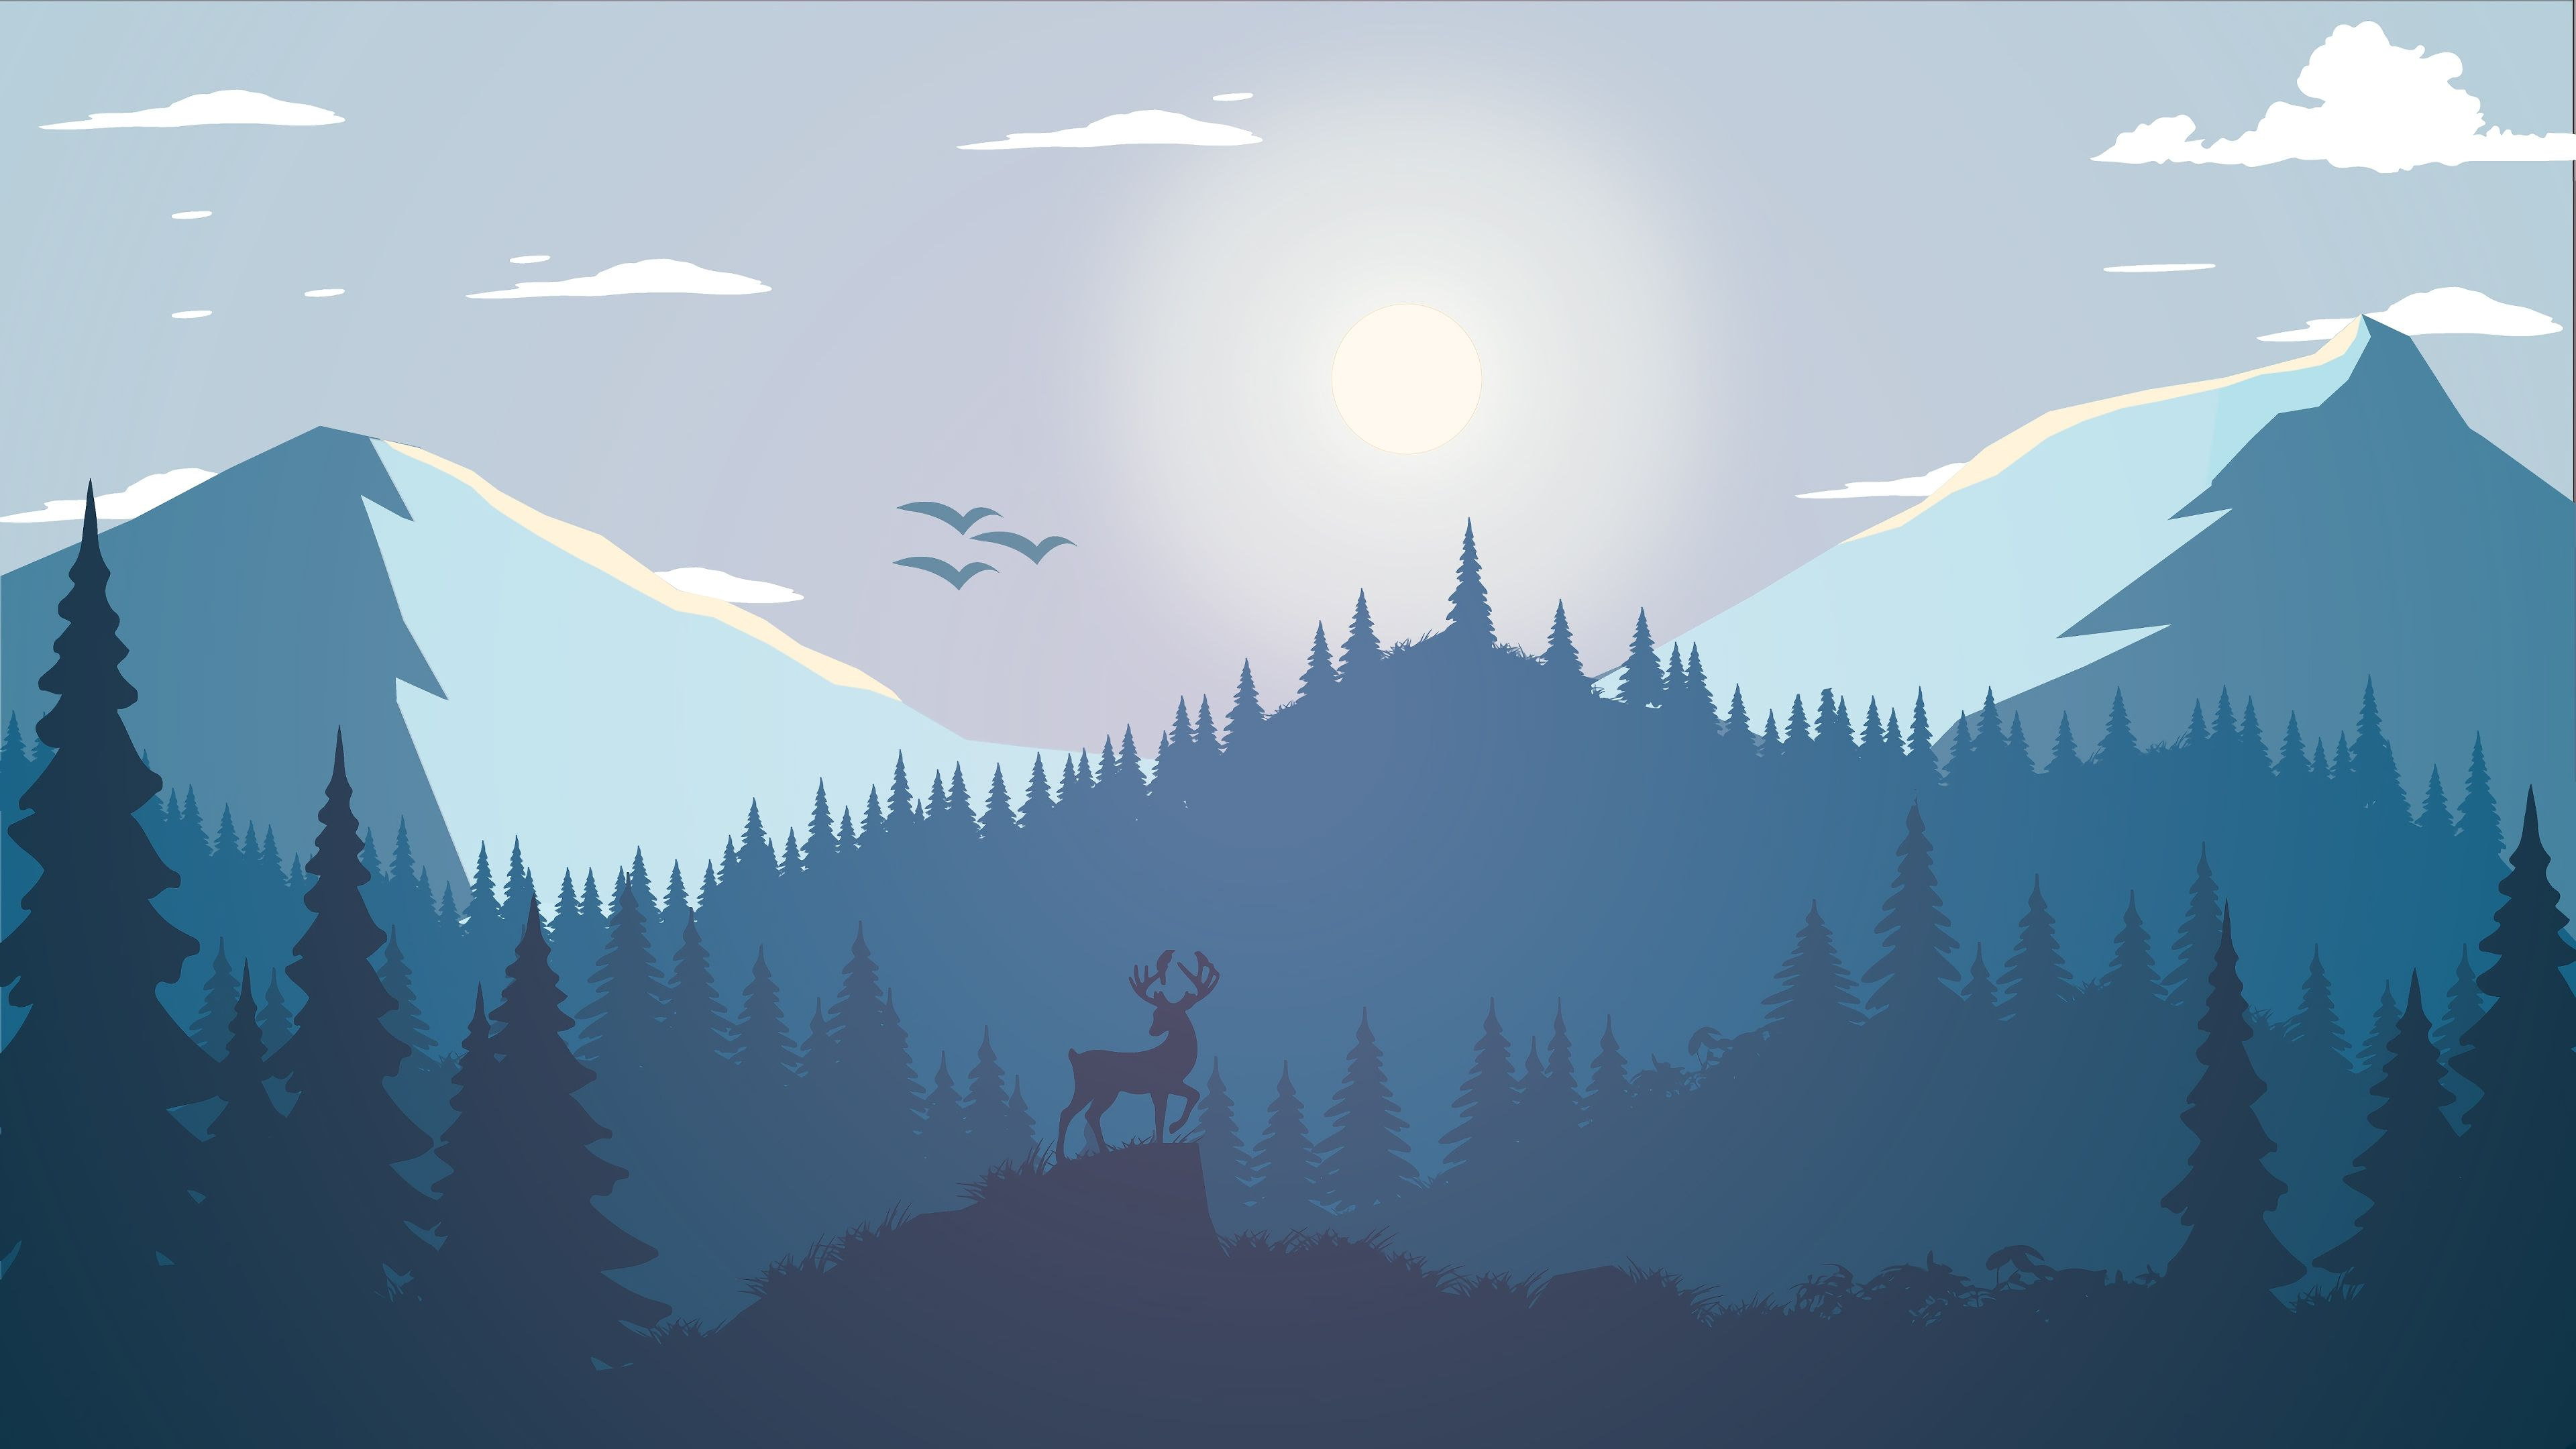 Blue Deer 3840x2160 Gambar Naga Gambar Animasi